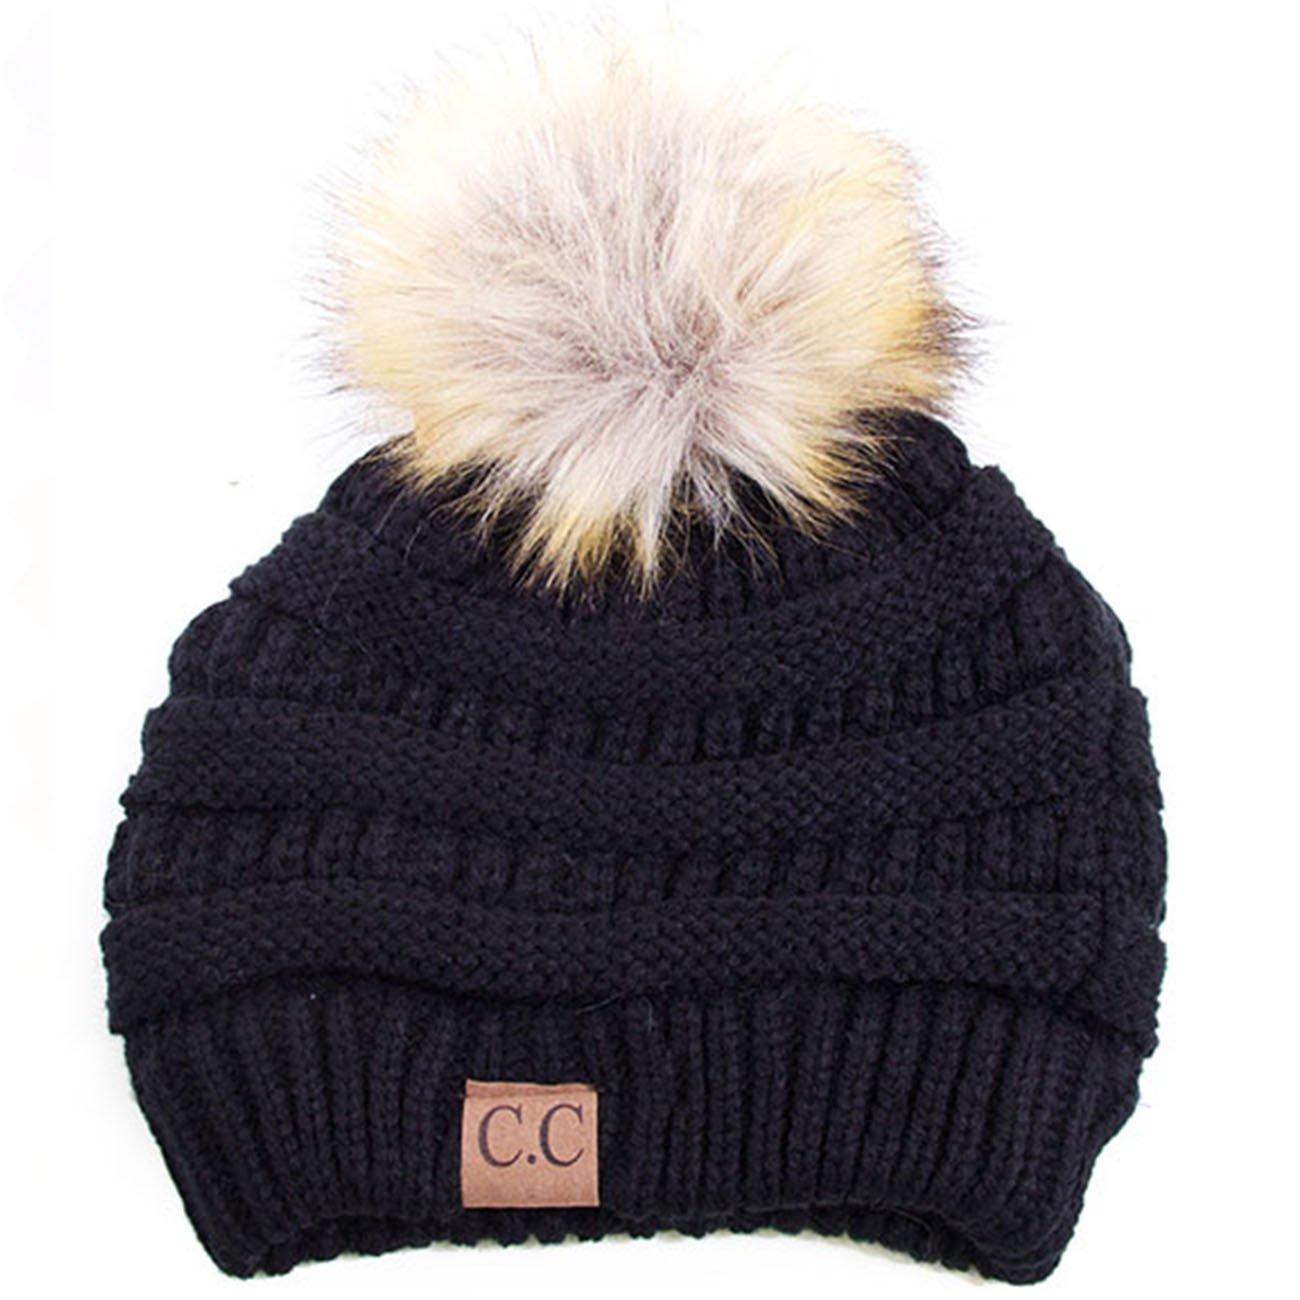 ScarvesMe CC Soft Stretch Cable Knit Ribbed Faux Fur Pom Pom Beanie Hat (Black)